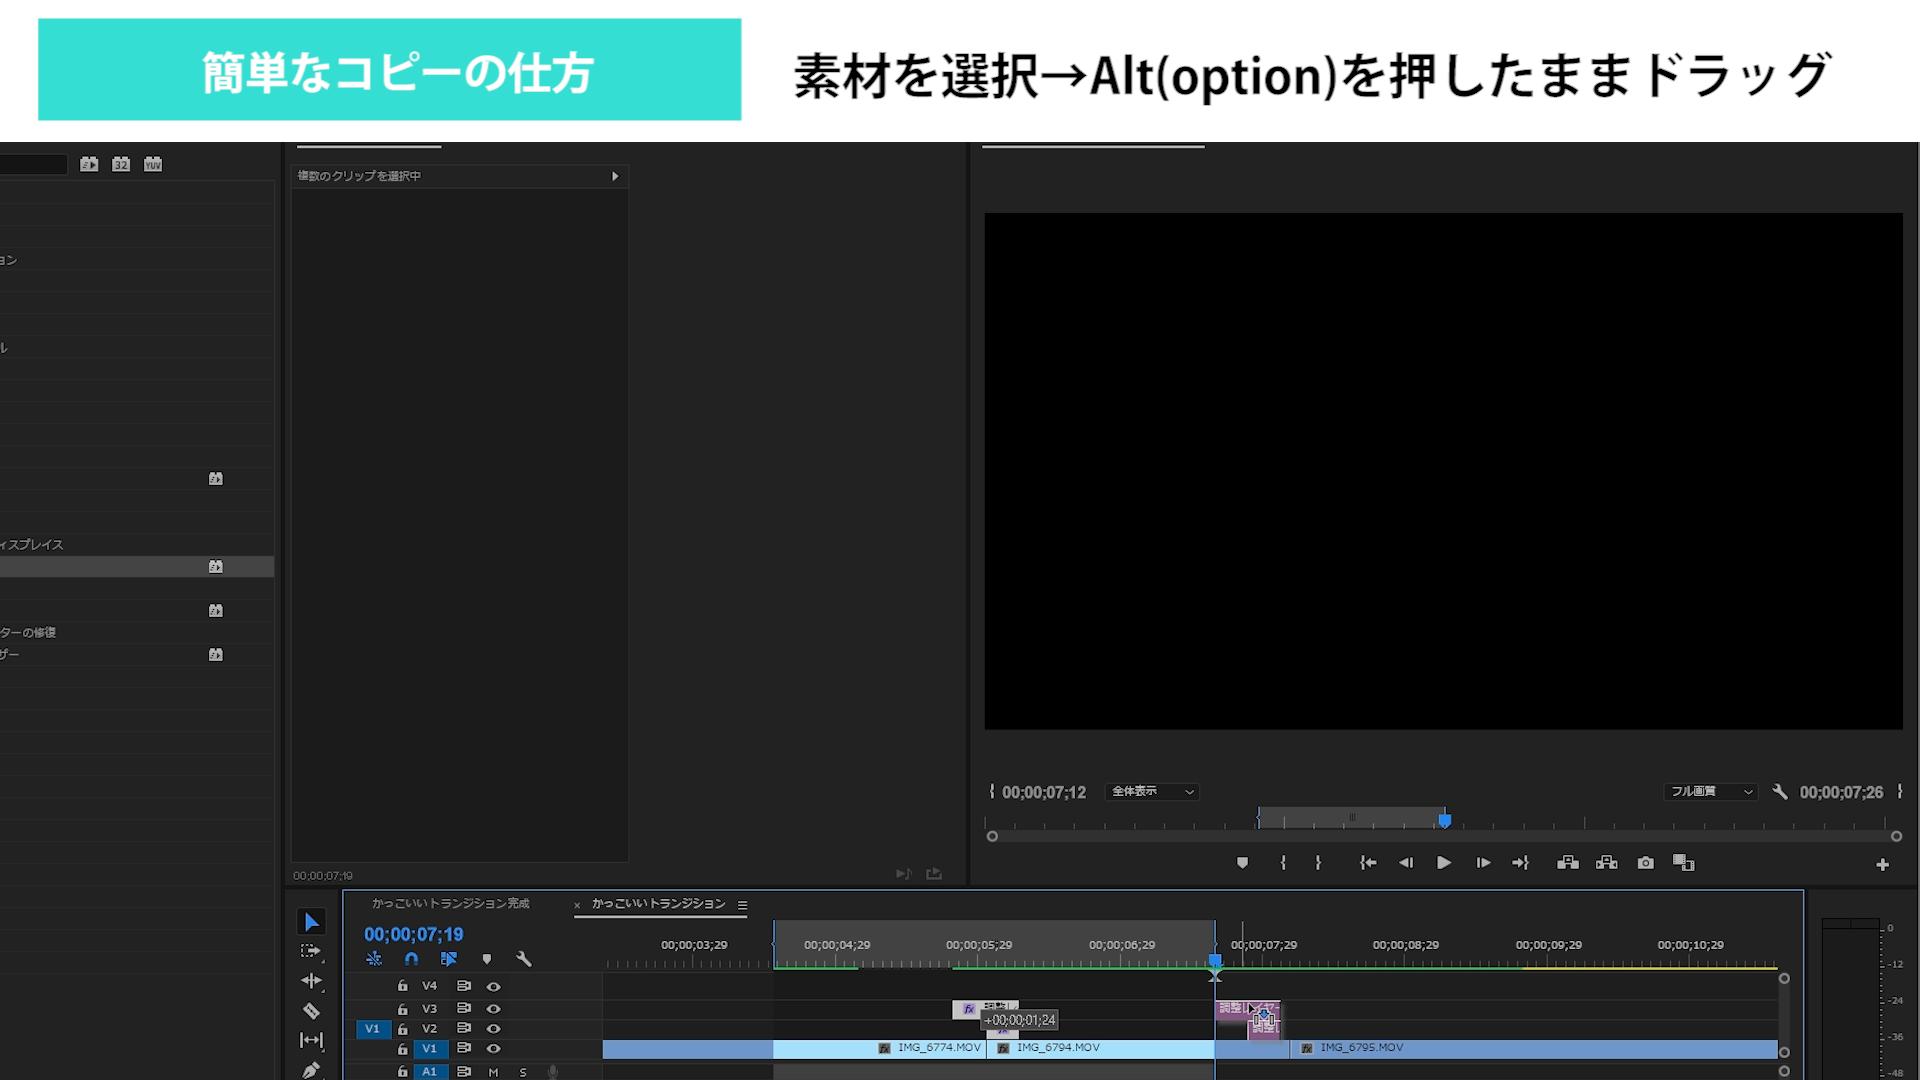 Alt(option)を押しながらドラッグアンドドロップ